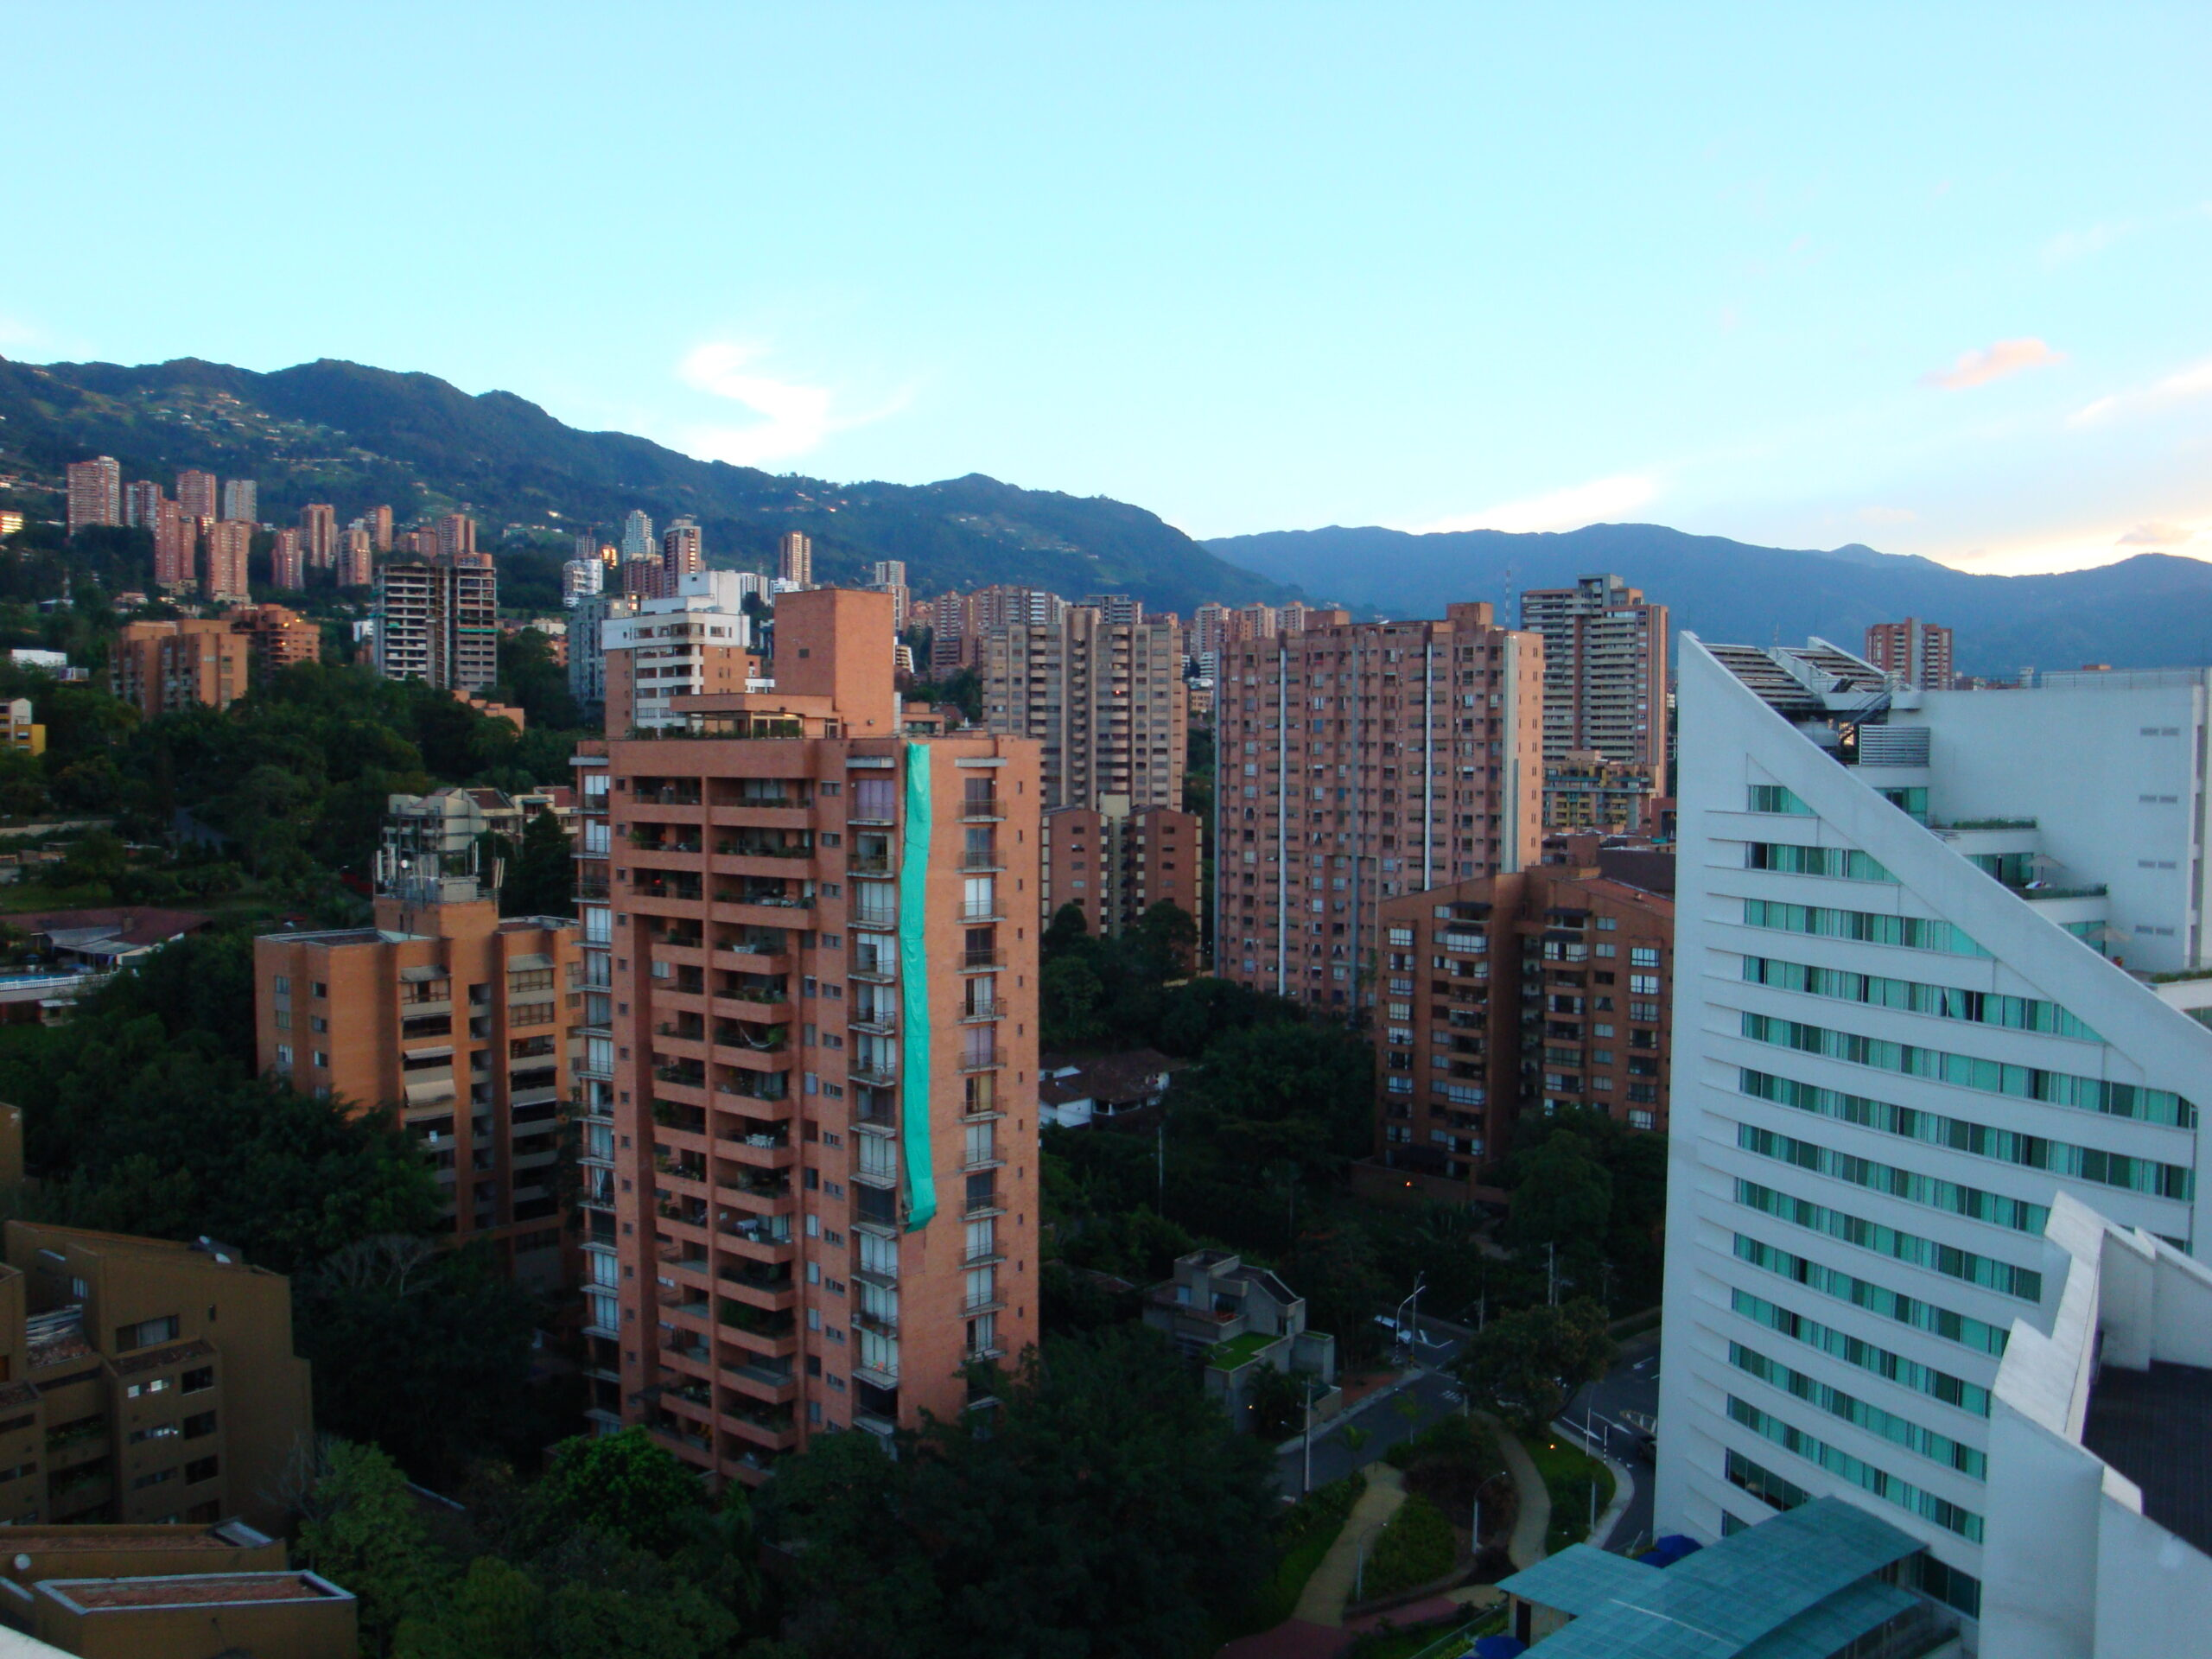 melhores-cidades-para-estudar-na-colombia-medellin